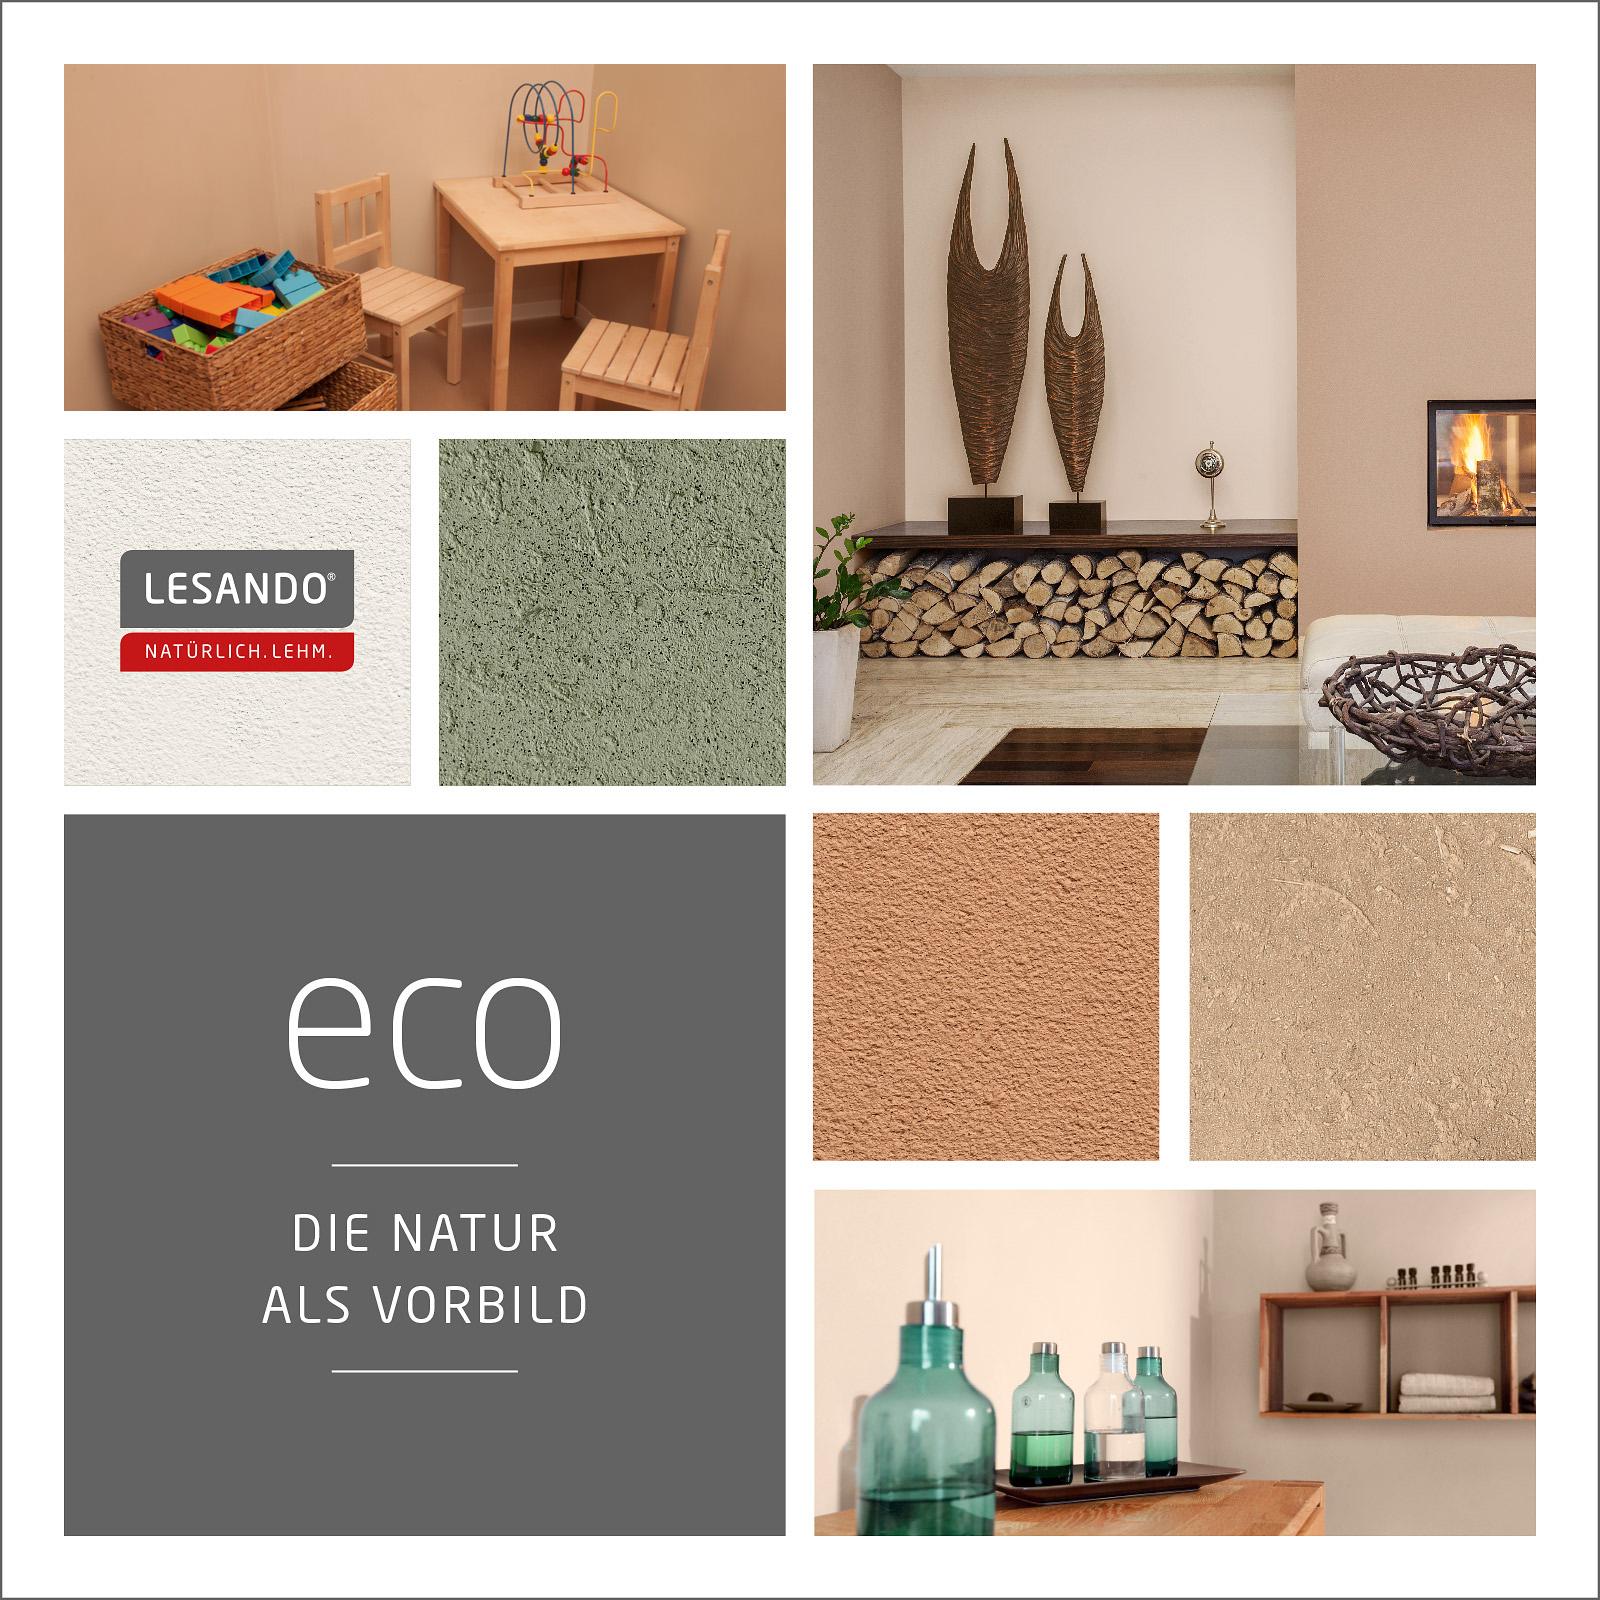 Lesando Stilwelten Lehmputz Lehmfarbe Stilwelt eco